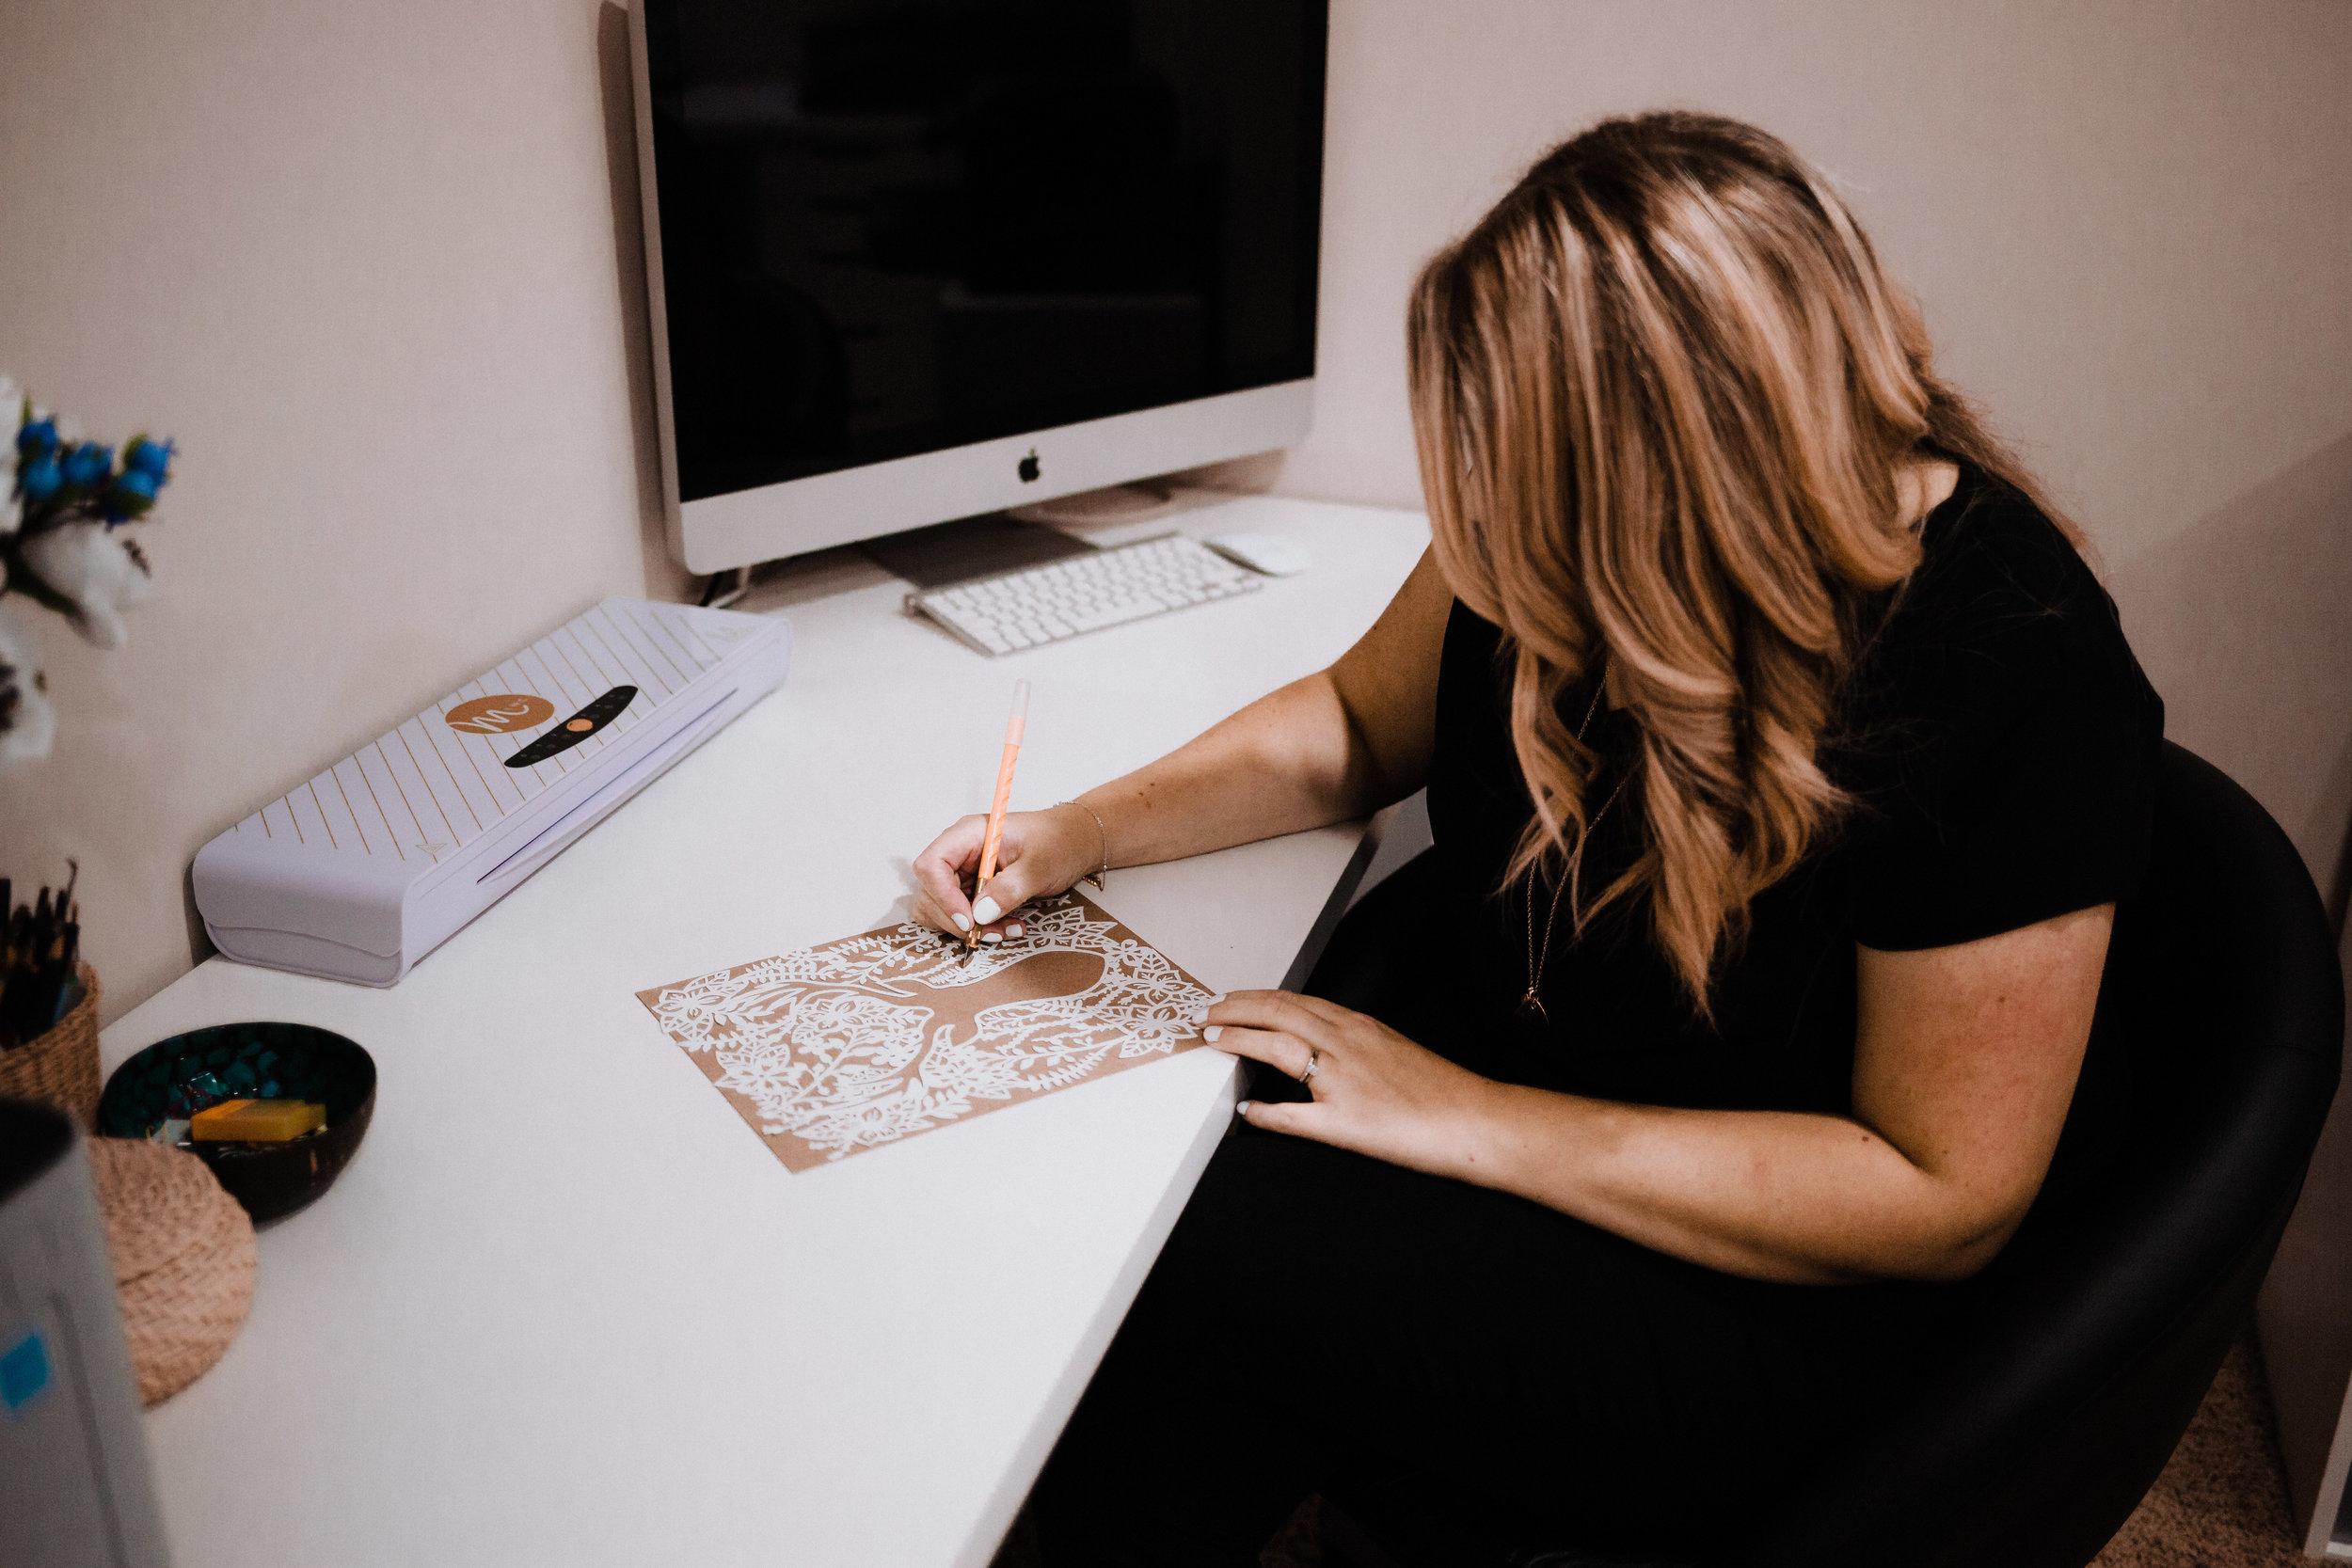 Ta Muchly Designs Hand cut paper designs